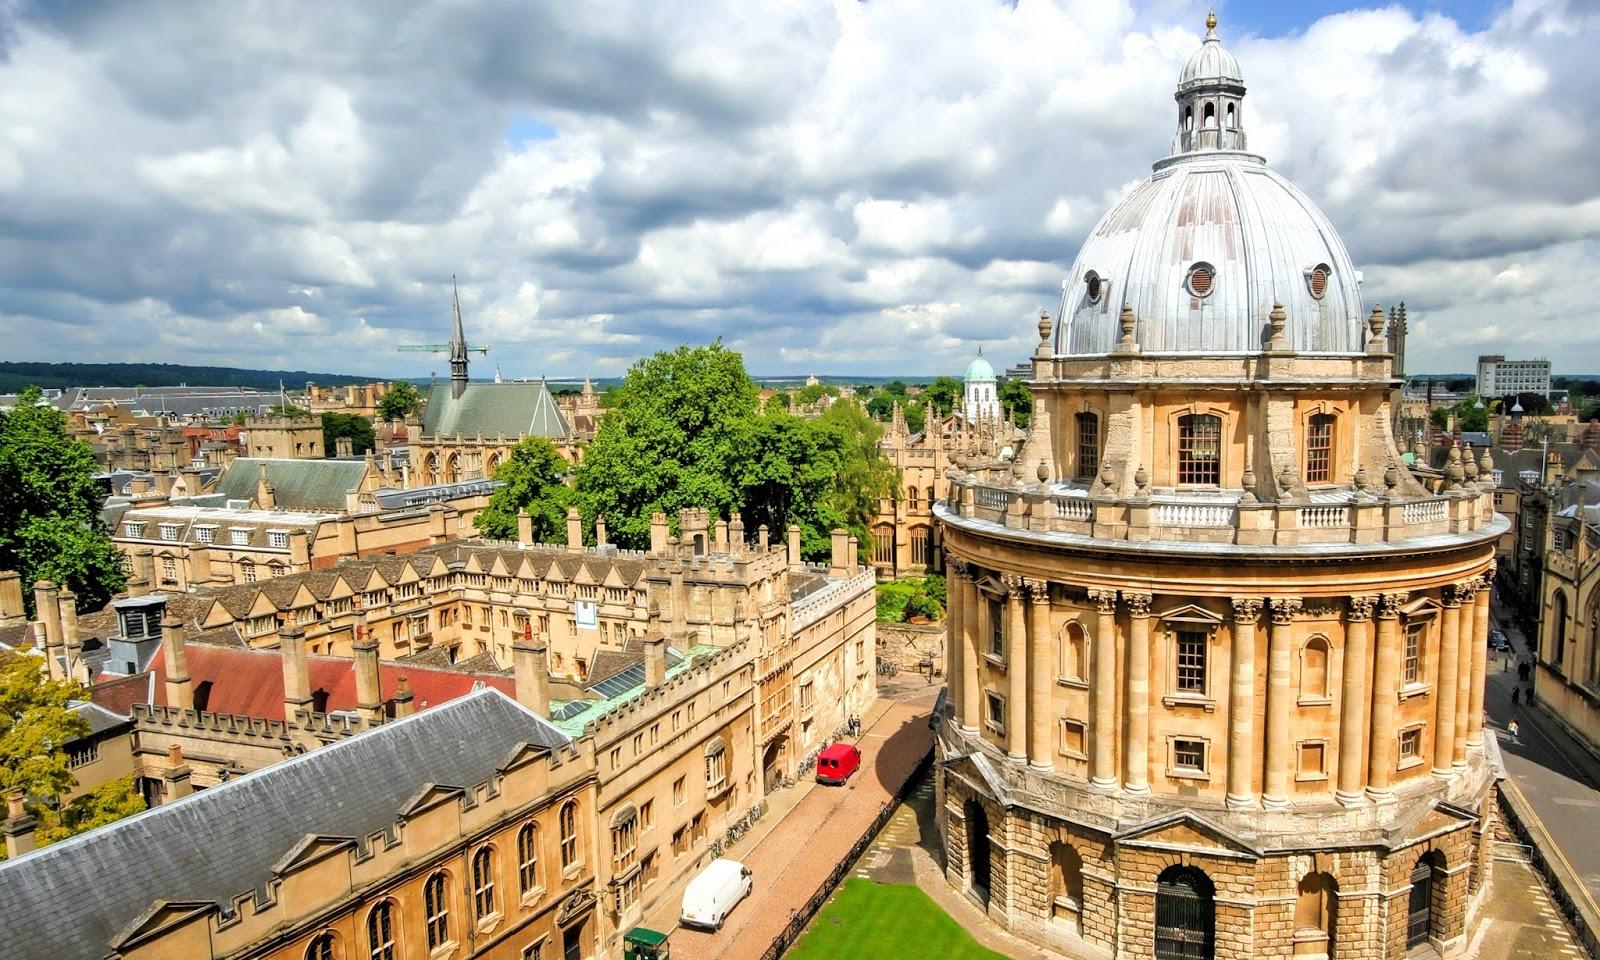 THE 'Table of Tables' 2021 - University of Oxford patahkan rekor Cambridge